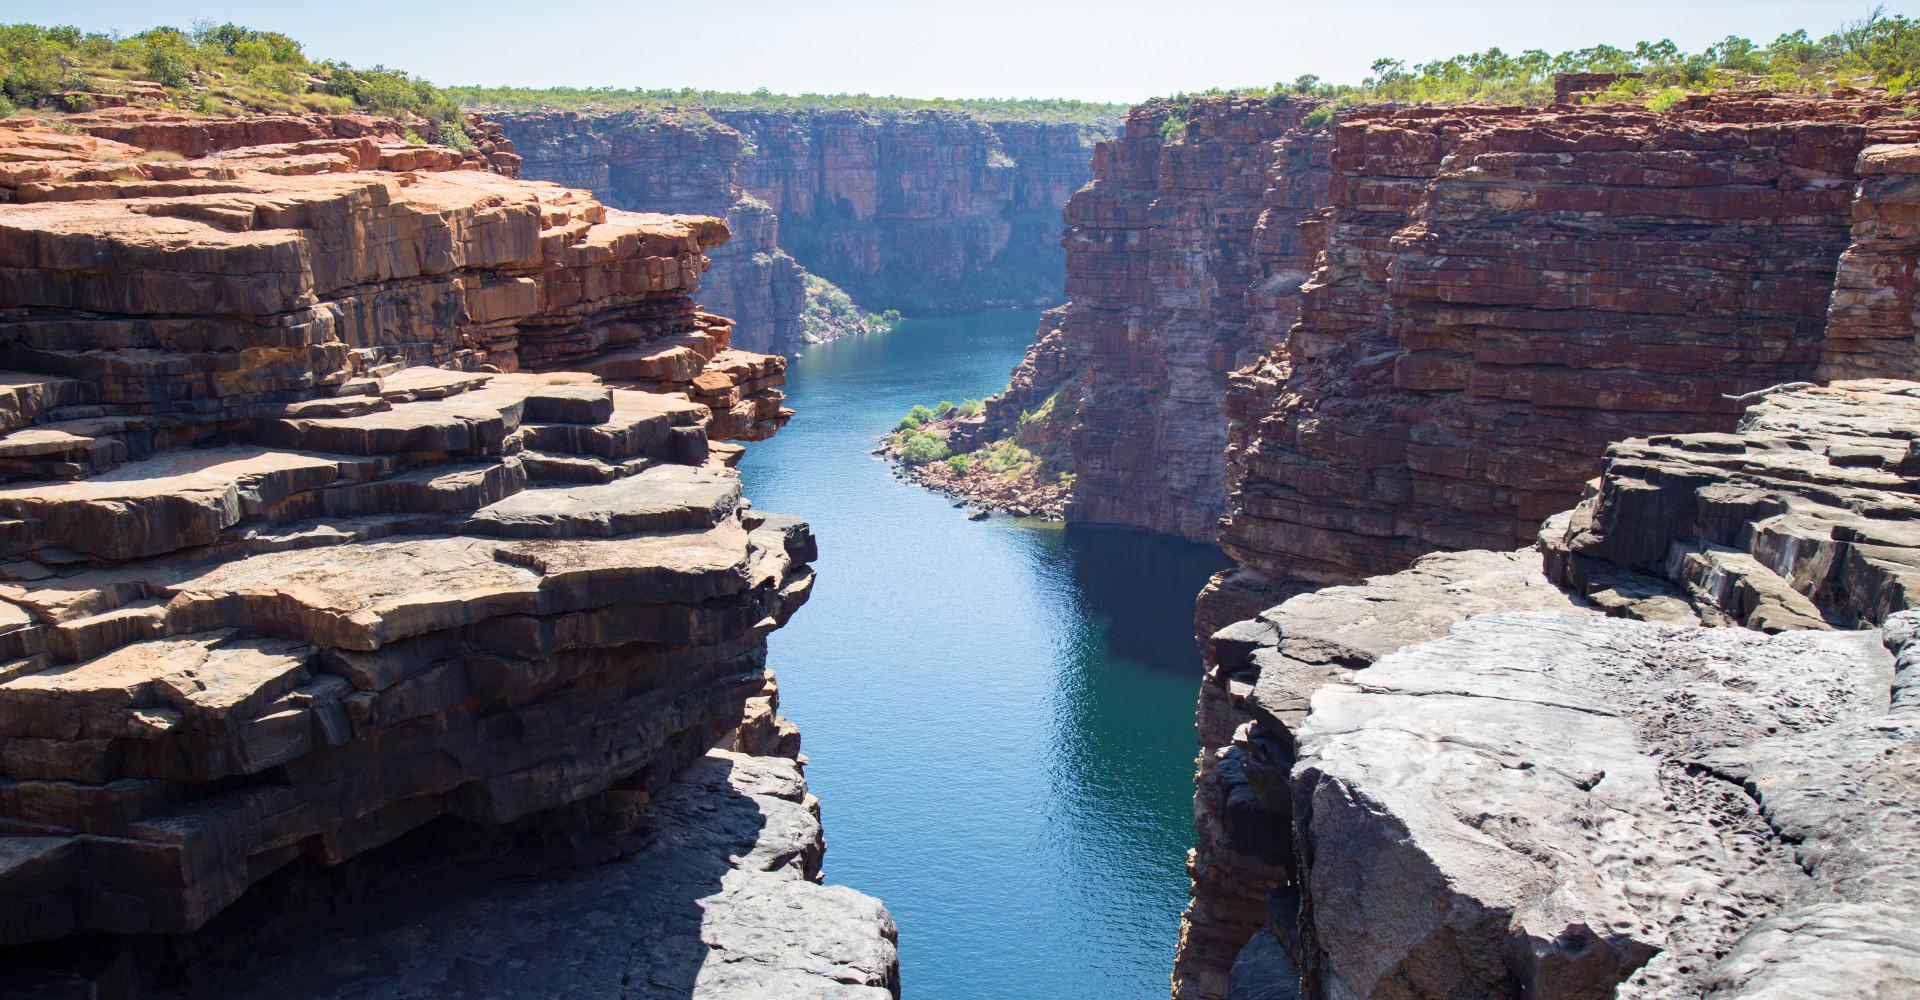 Western Australia's breathtaking Kimberley Region